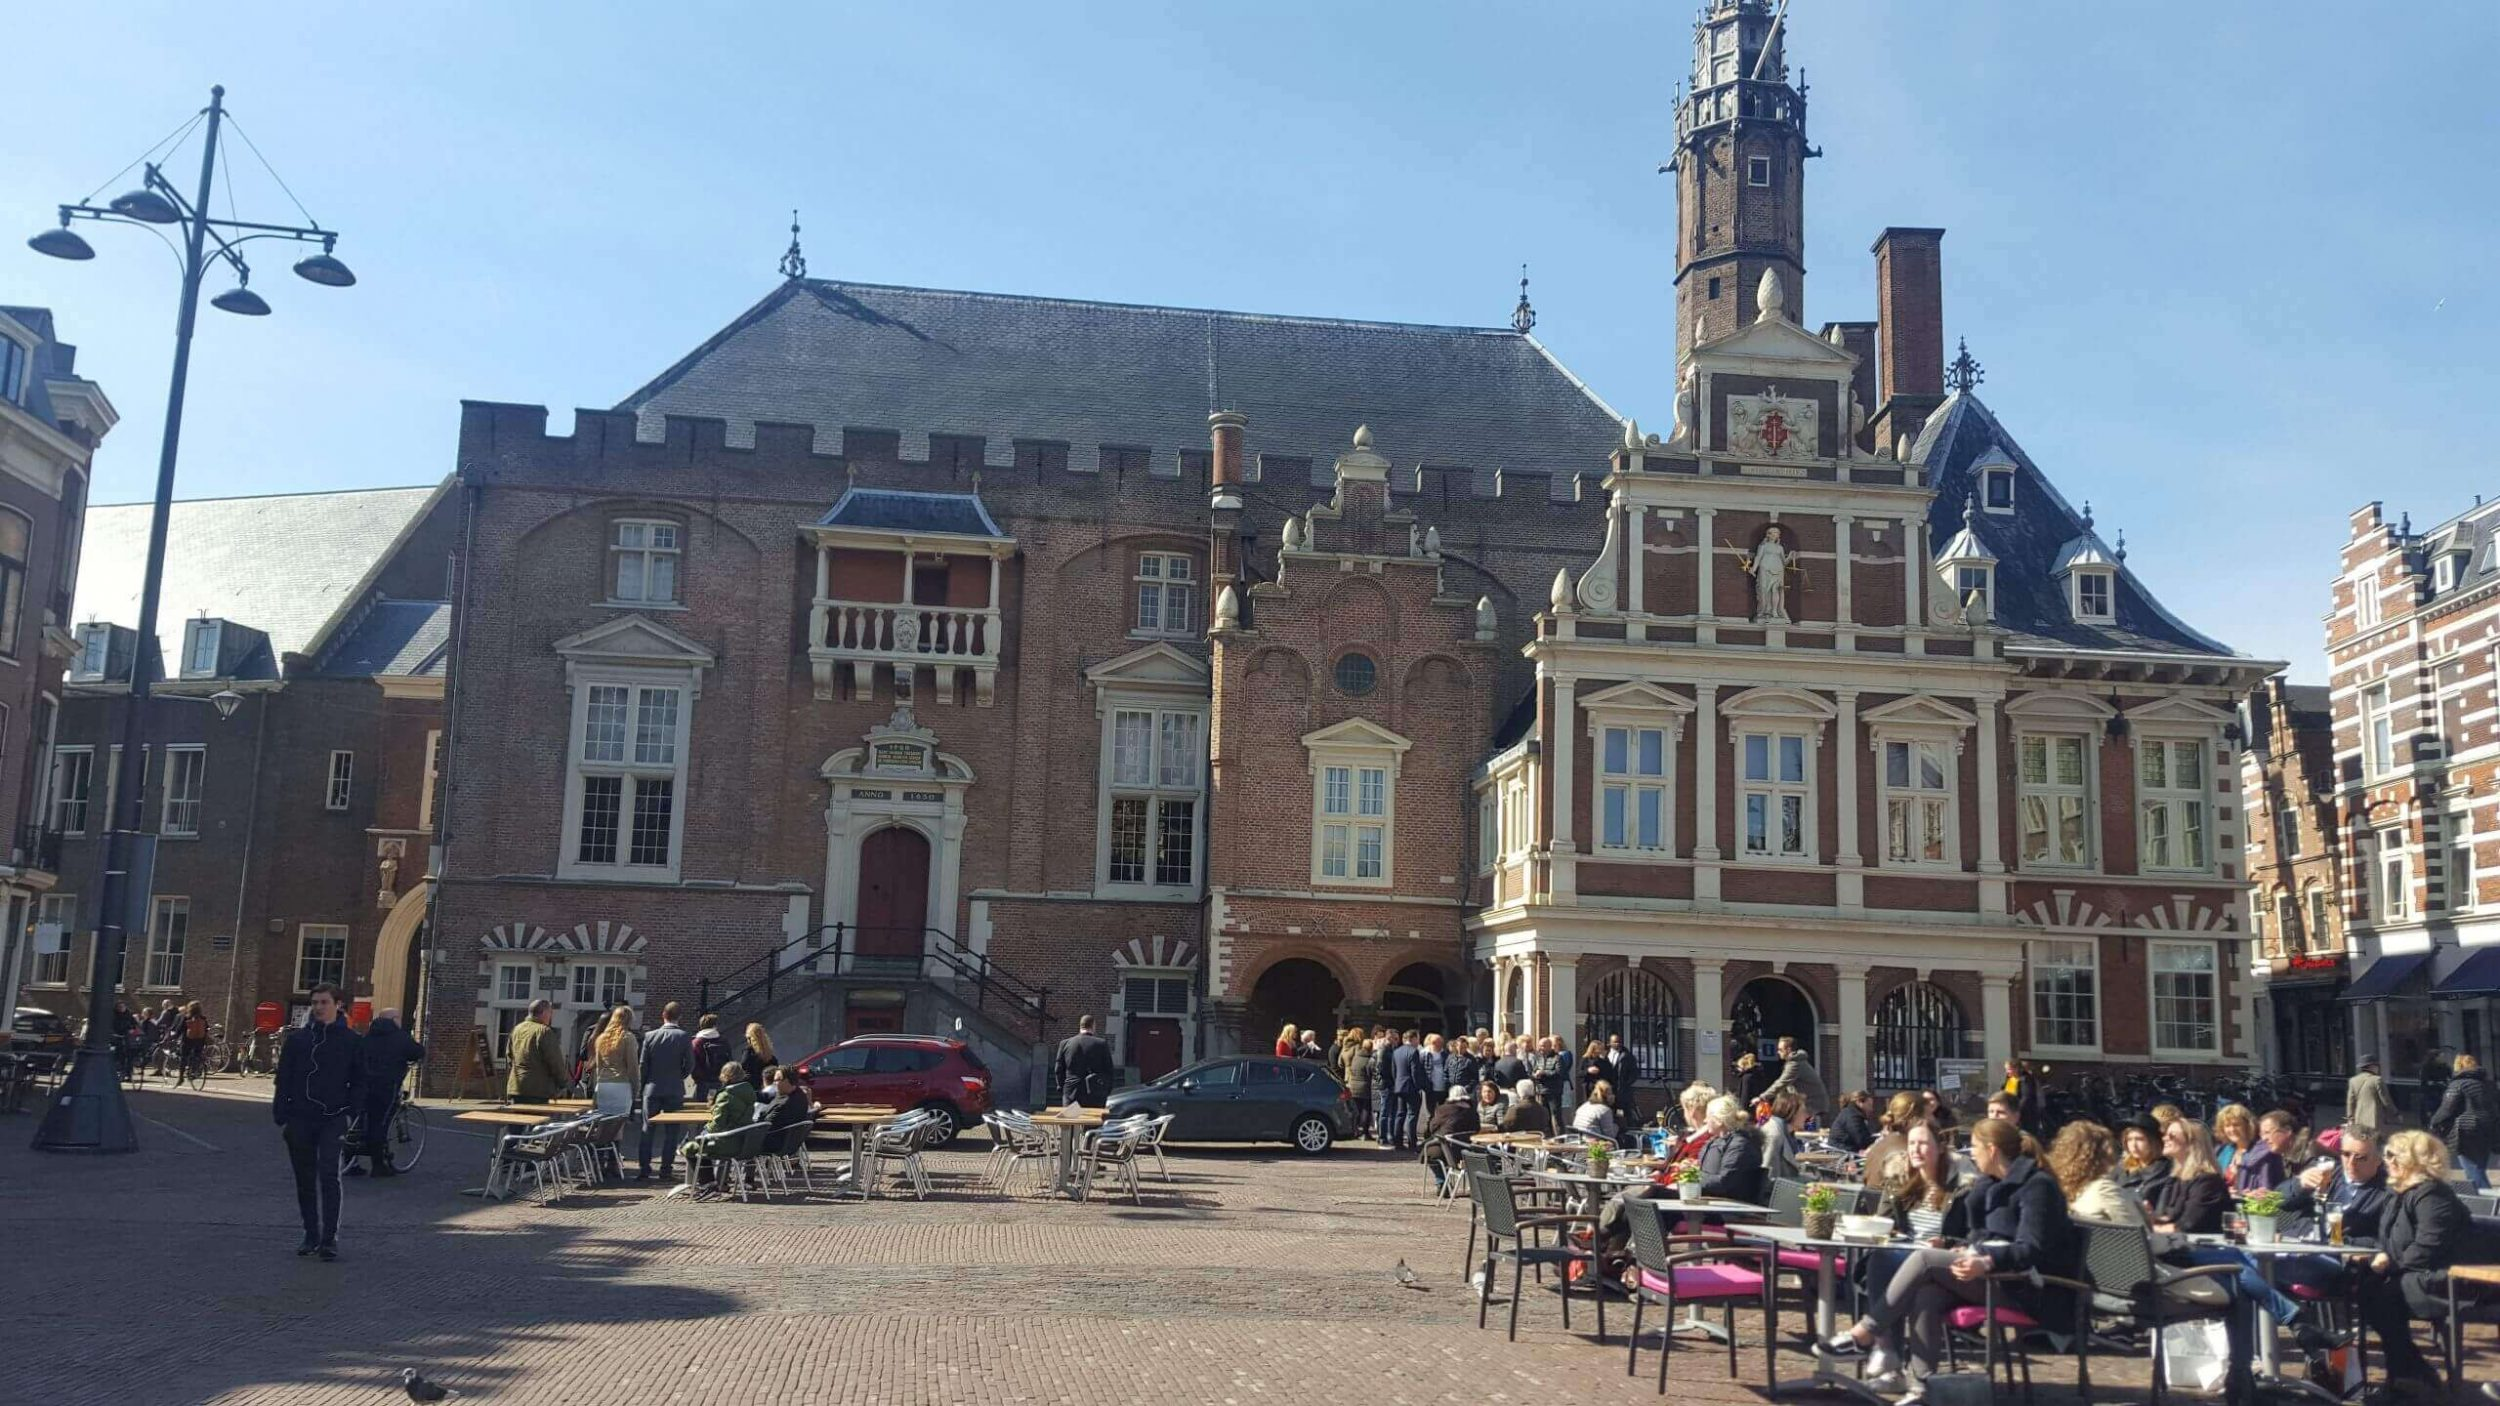 Grote-Markt-Haarlem - Amsterdam